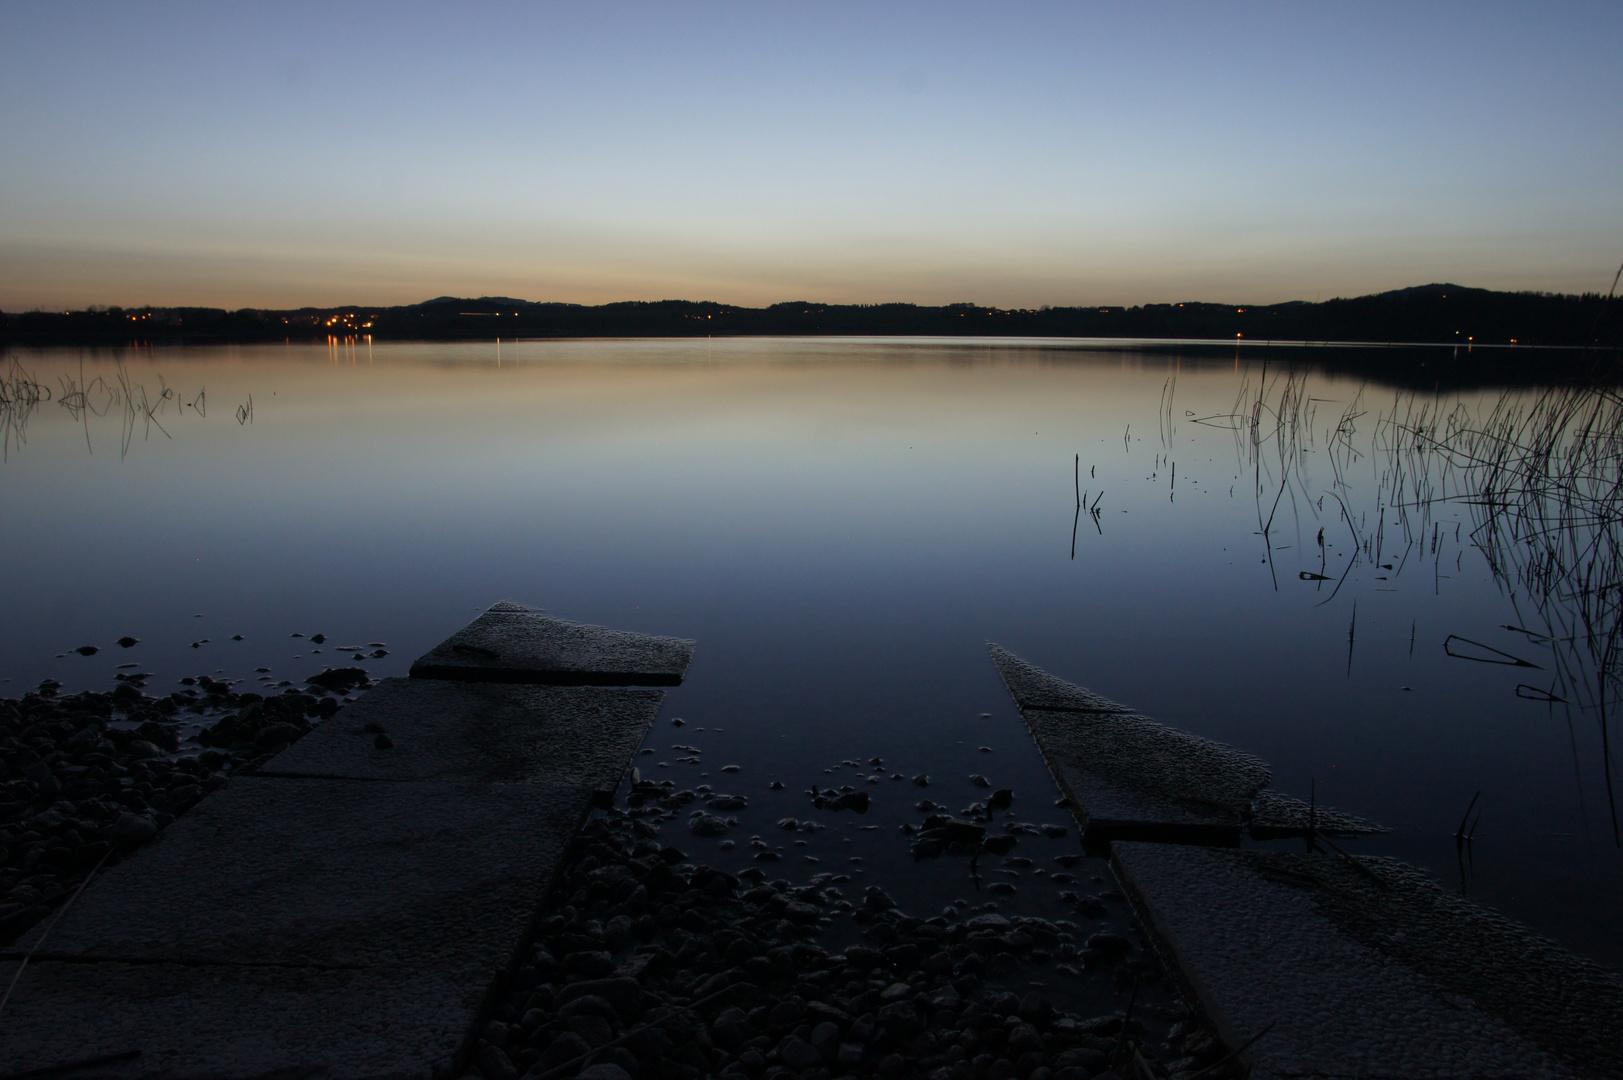 Wallersee-Ufer in Henndorf